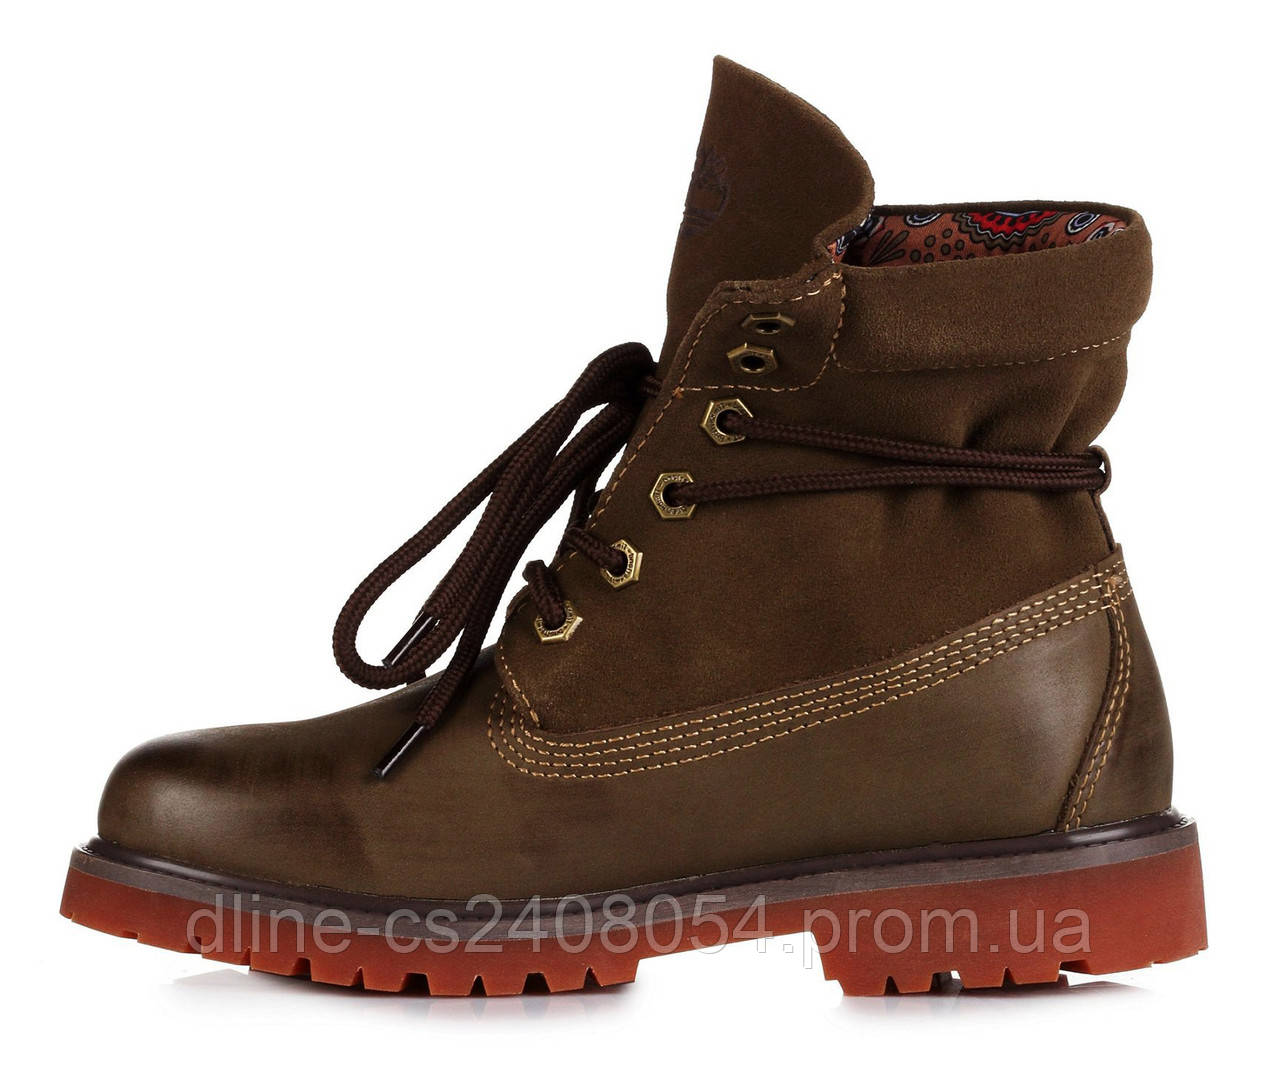 Женские ботинки Timberland Bandits Хаки